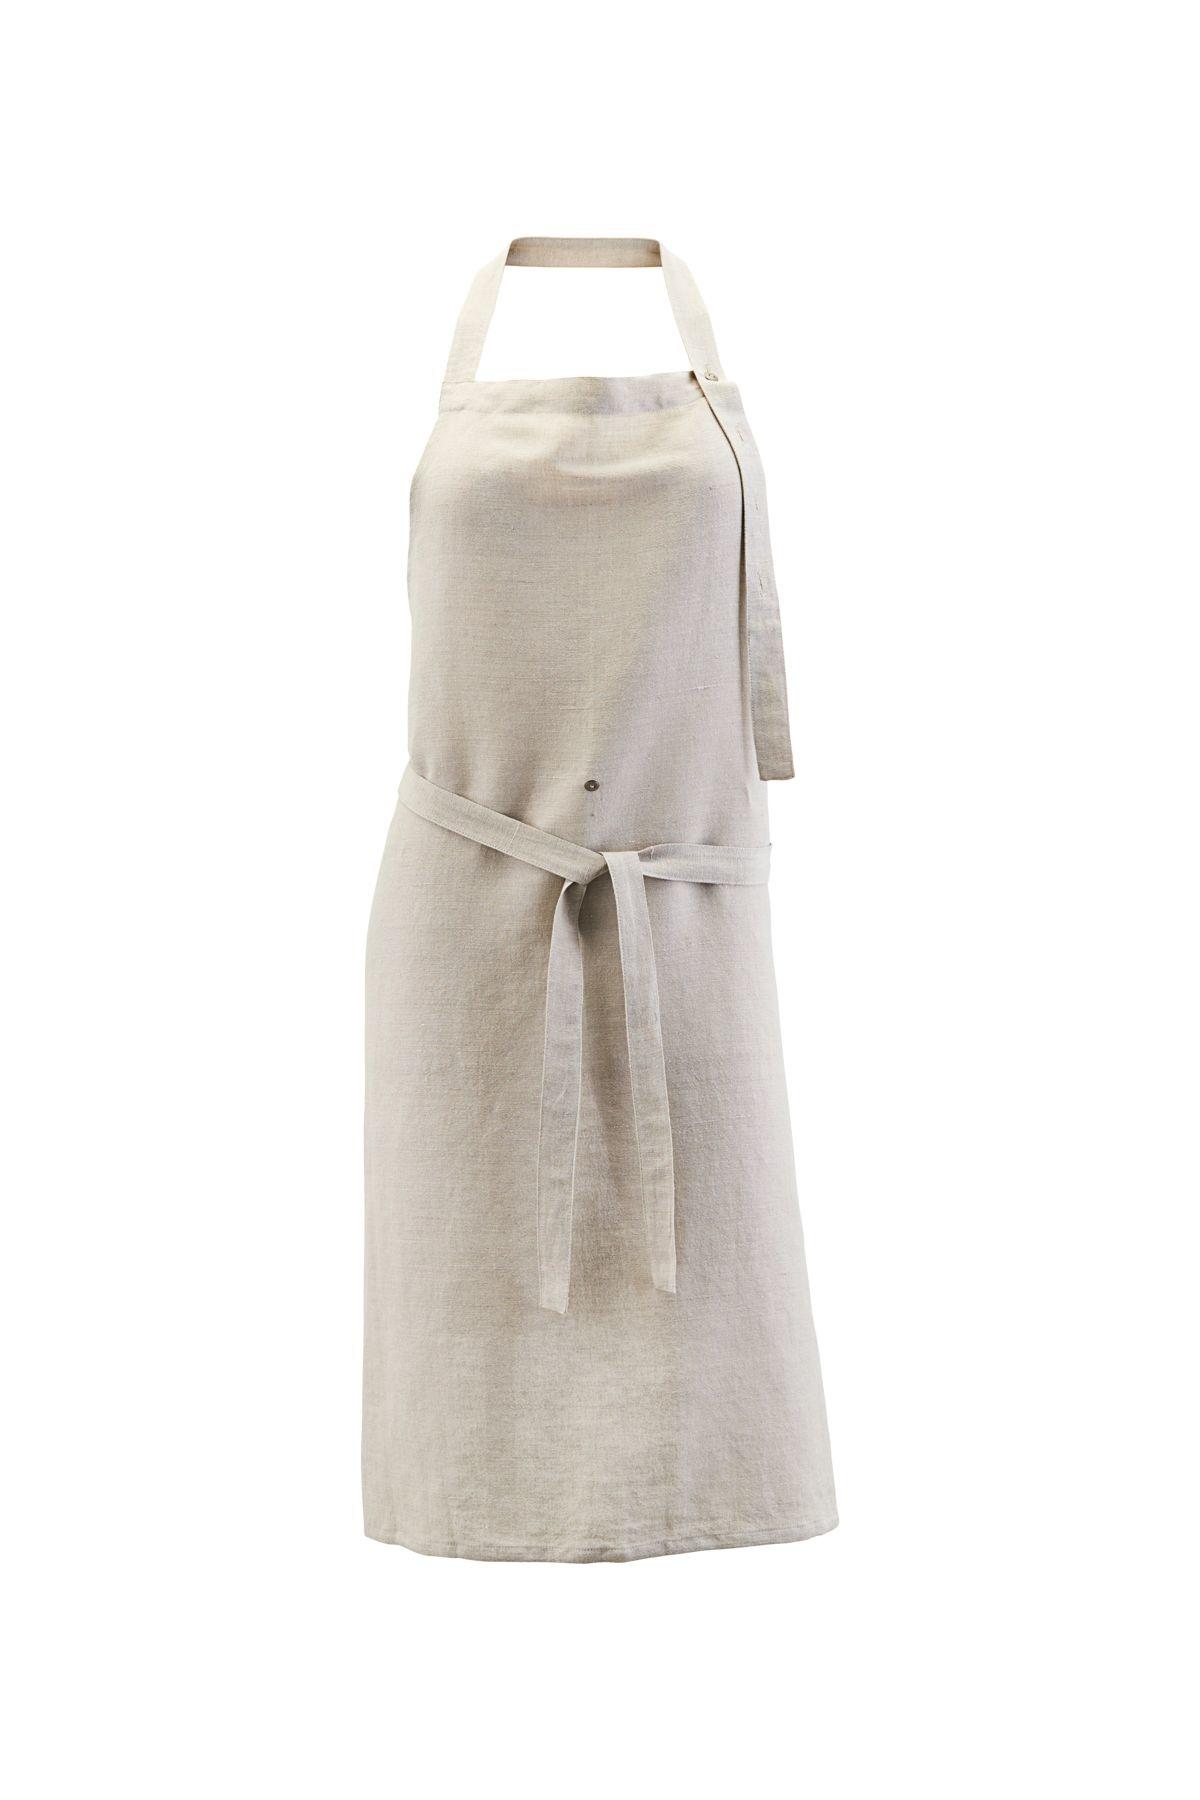 House Doctor Linen apron - light grey - House Doctor